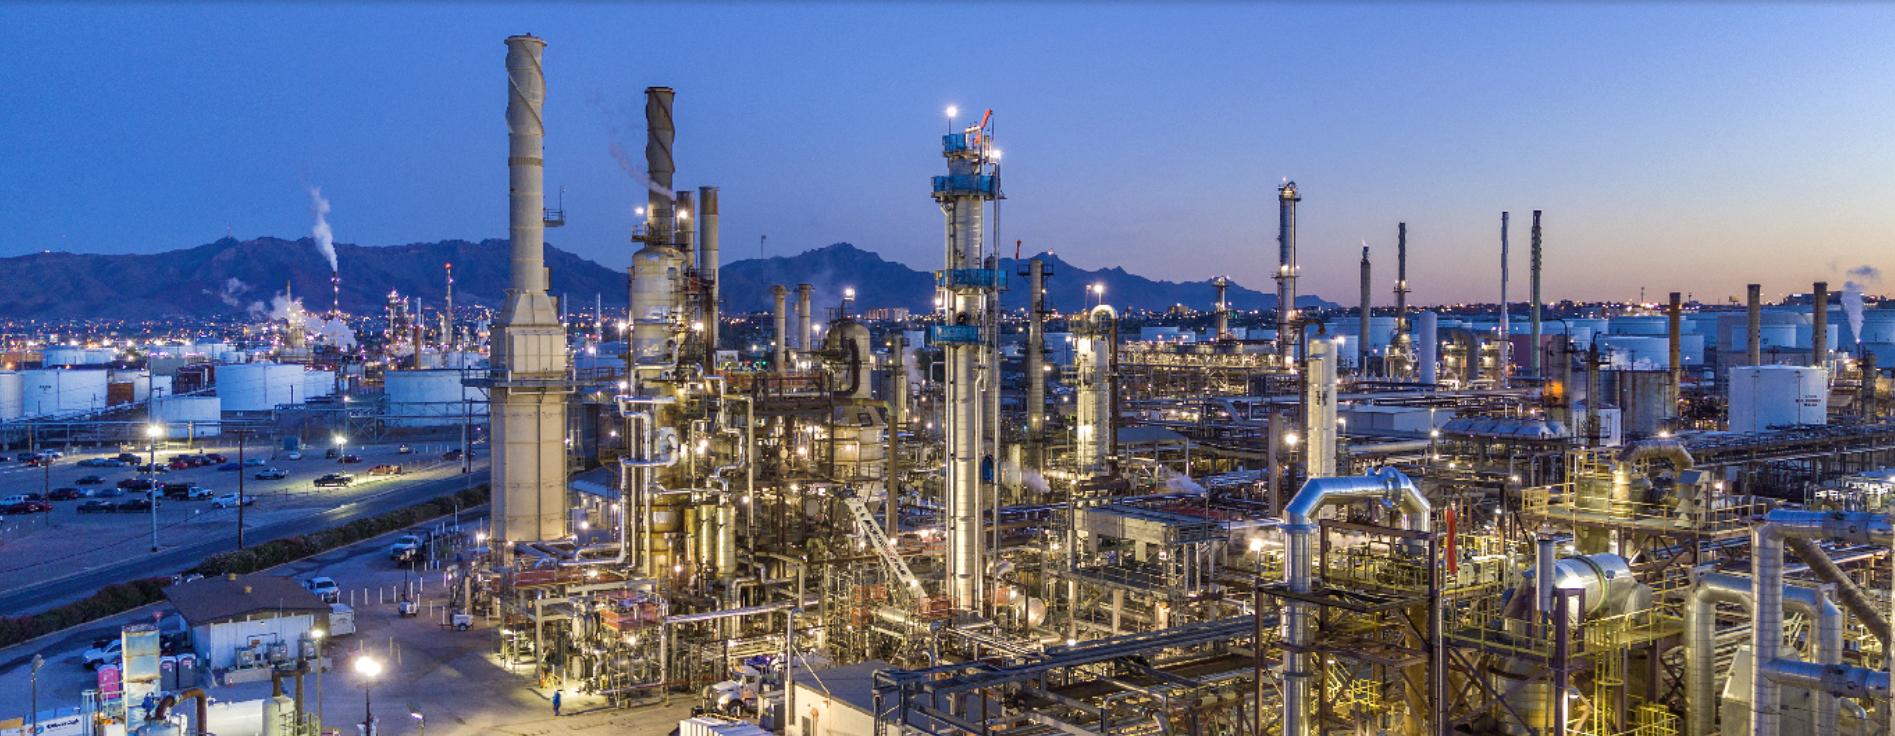 Refineries-picture